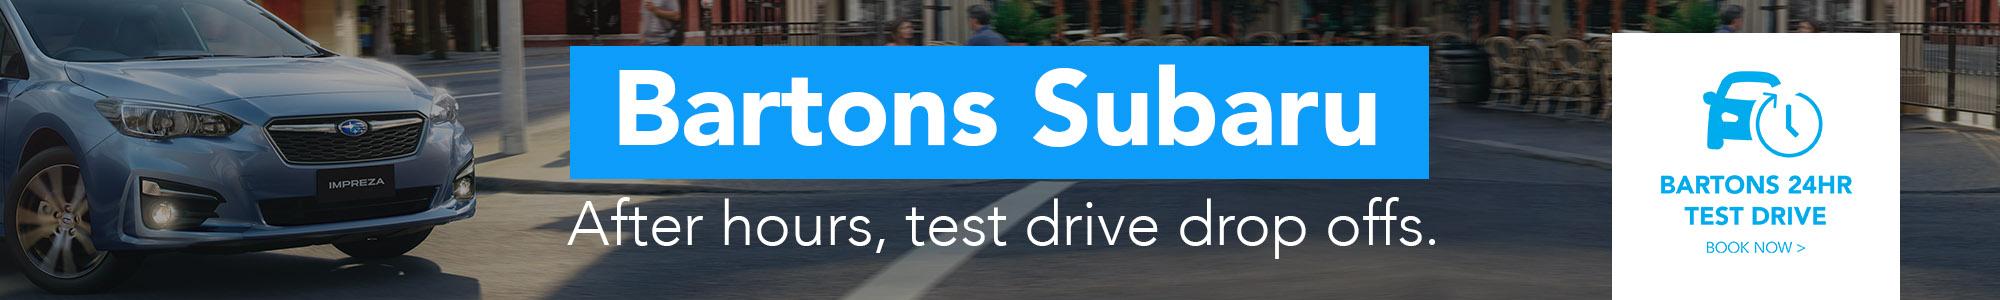 24hr Test Drive